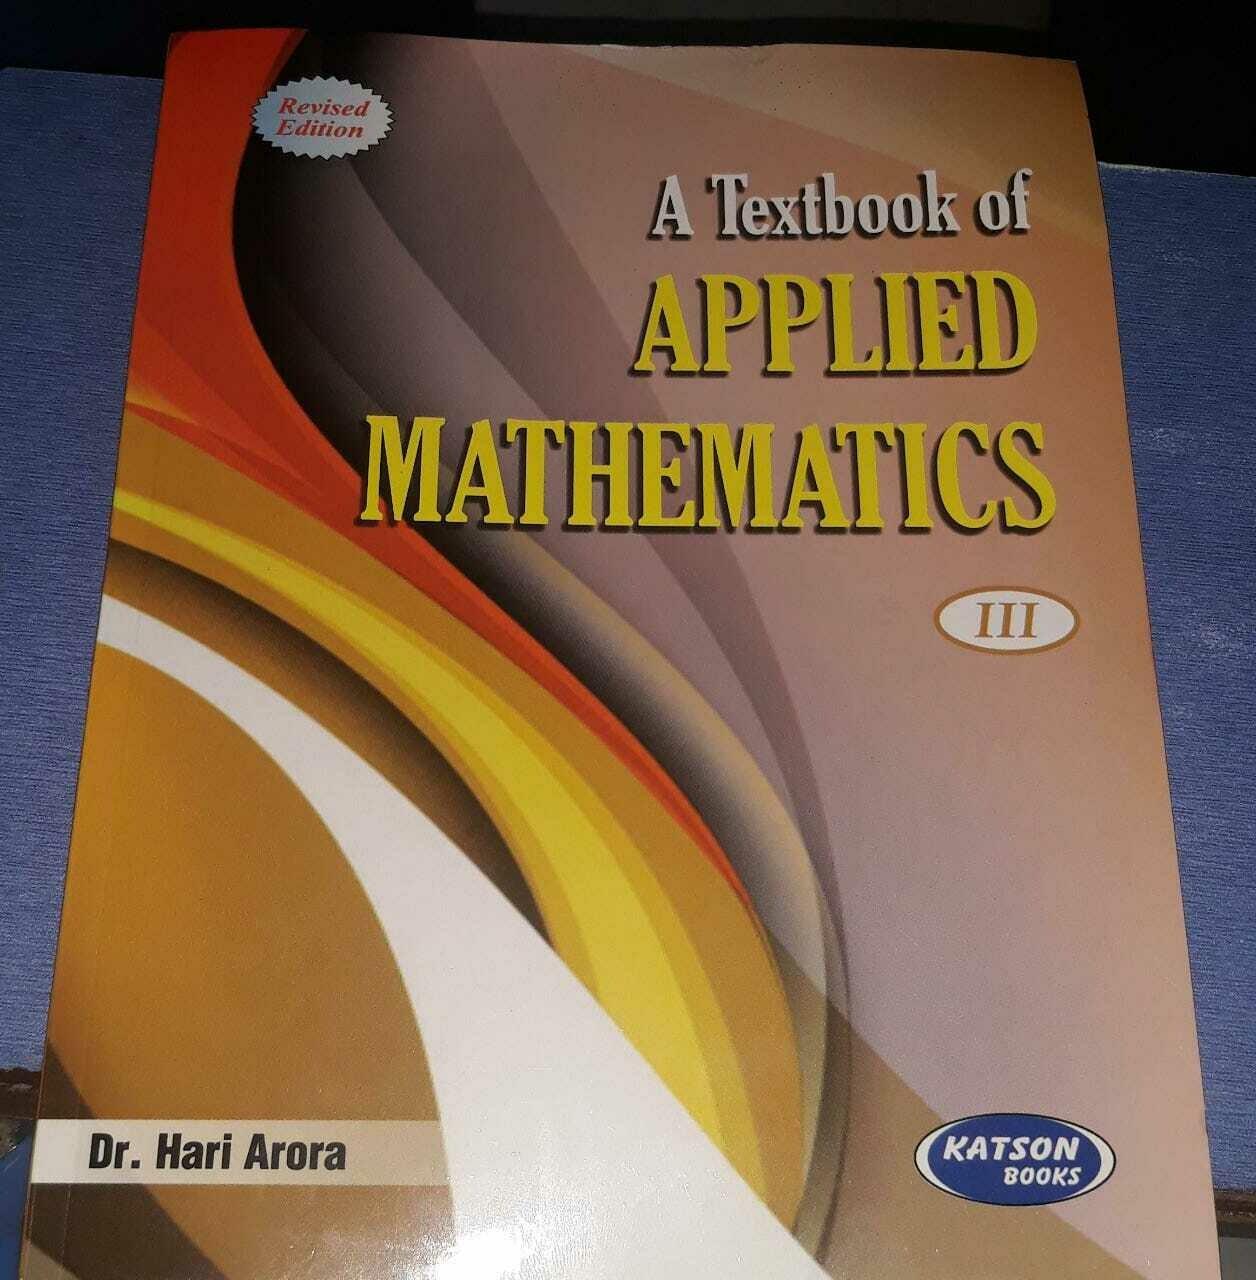 A Textbook of Applied Mathematics -III by Hari Arora